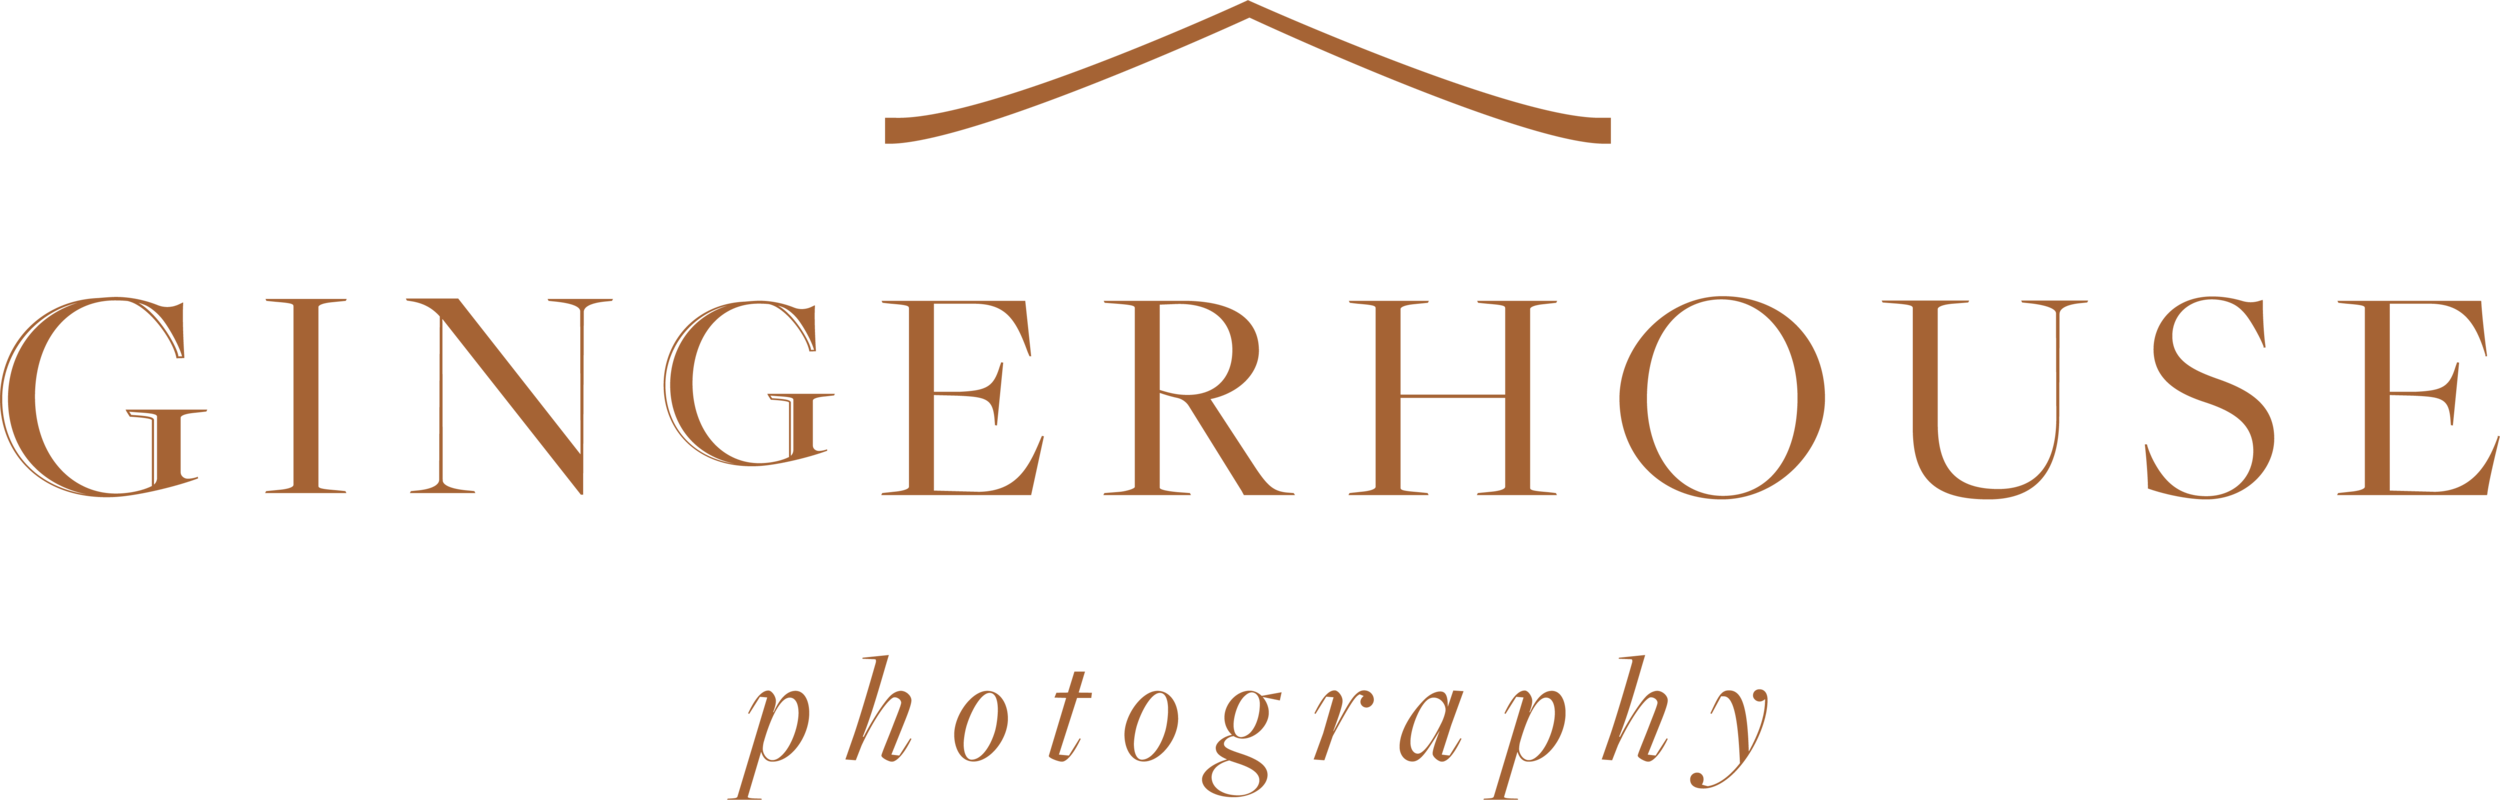 Gingerhouse Photography - KH Creative